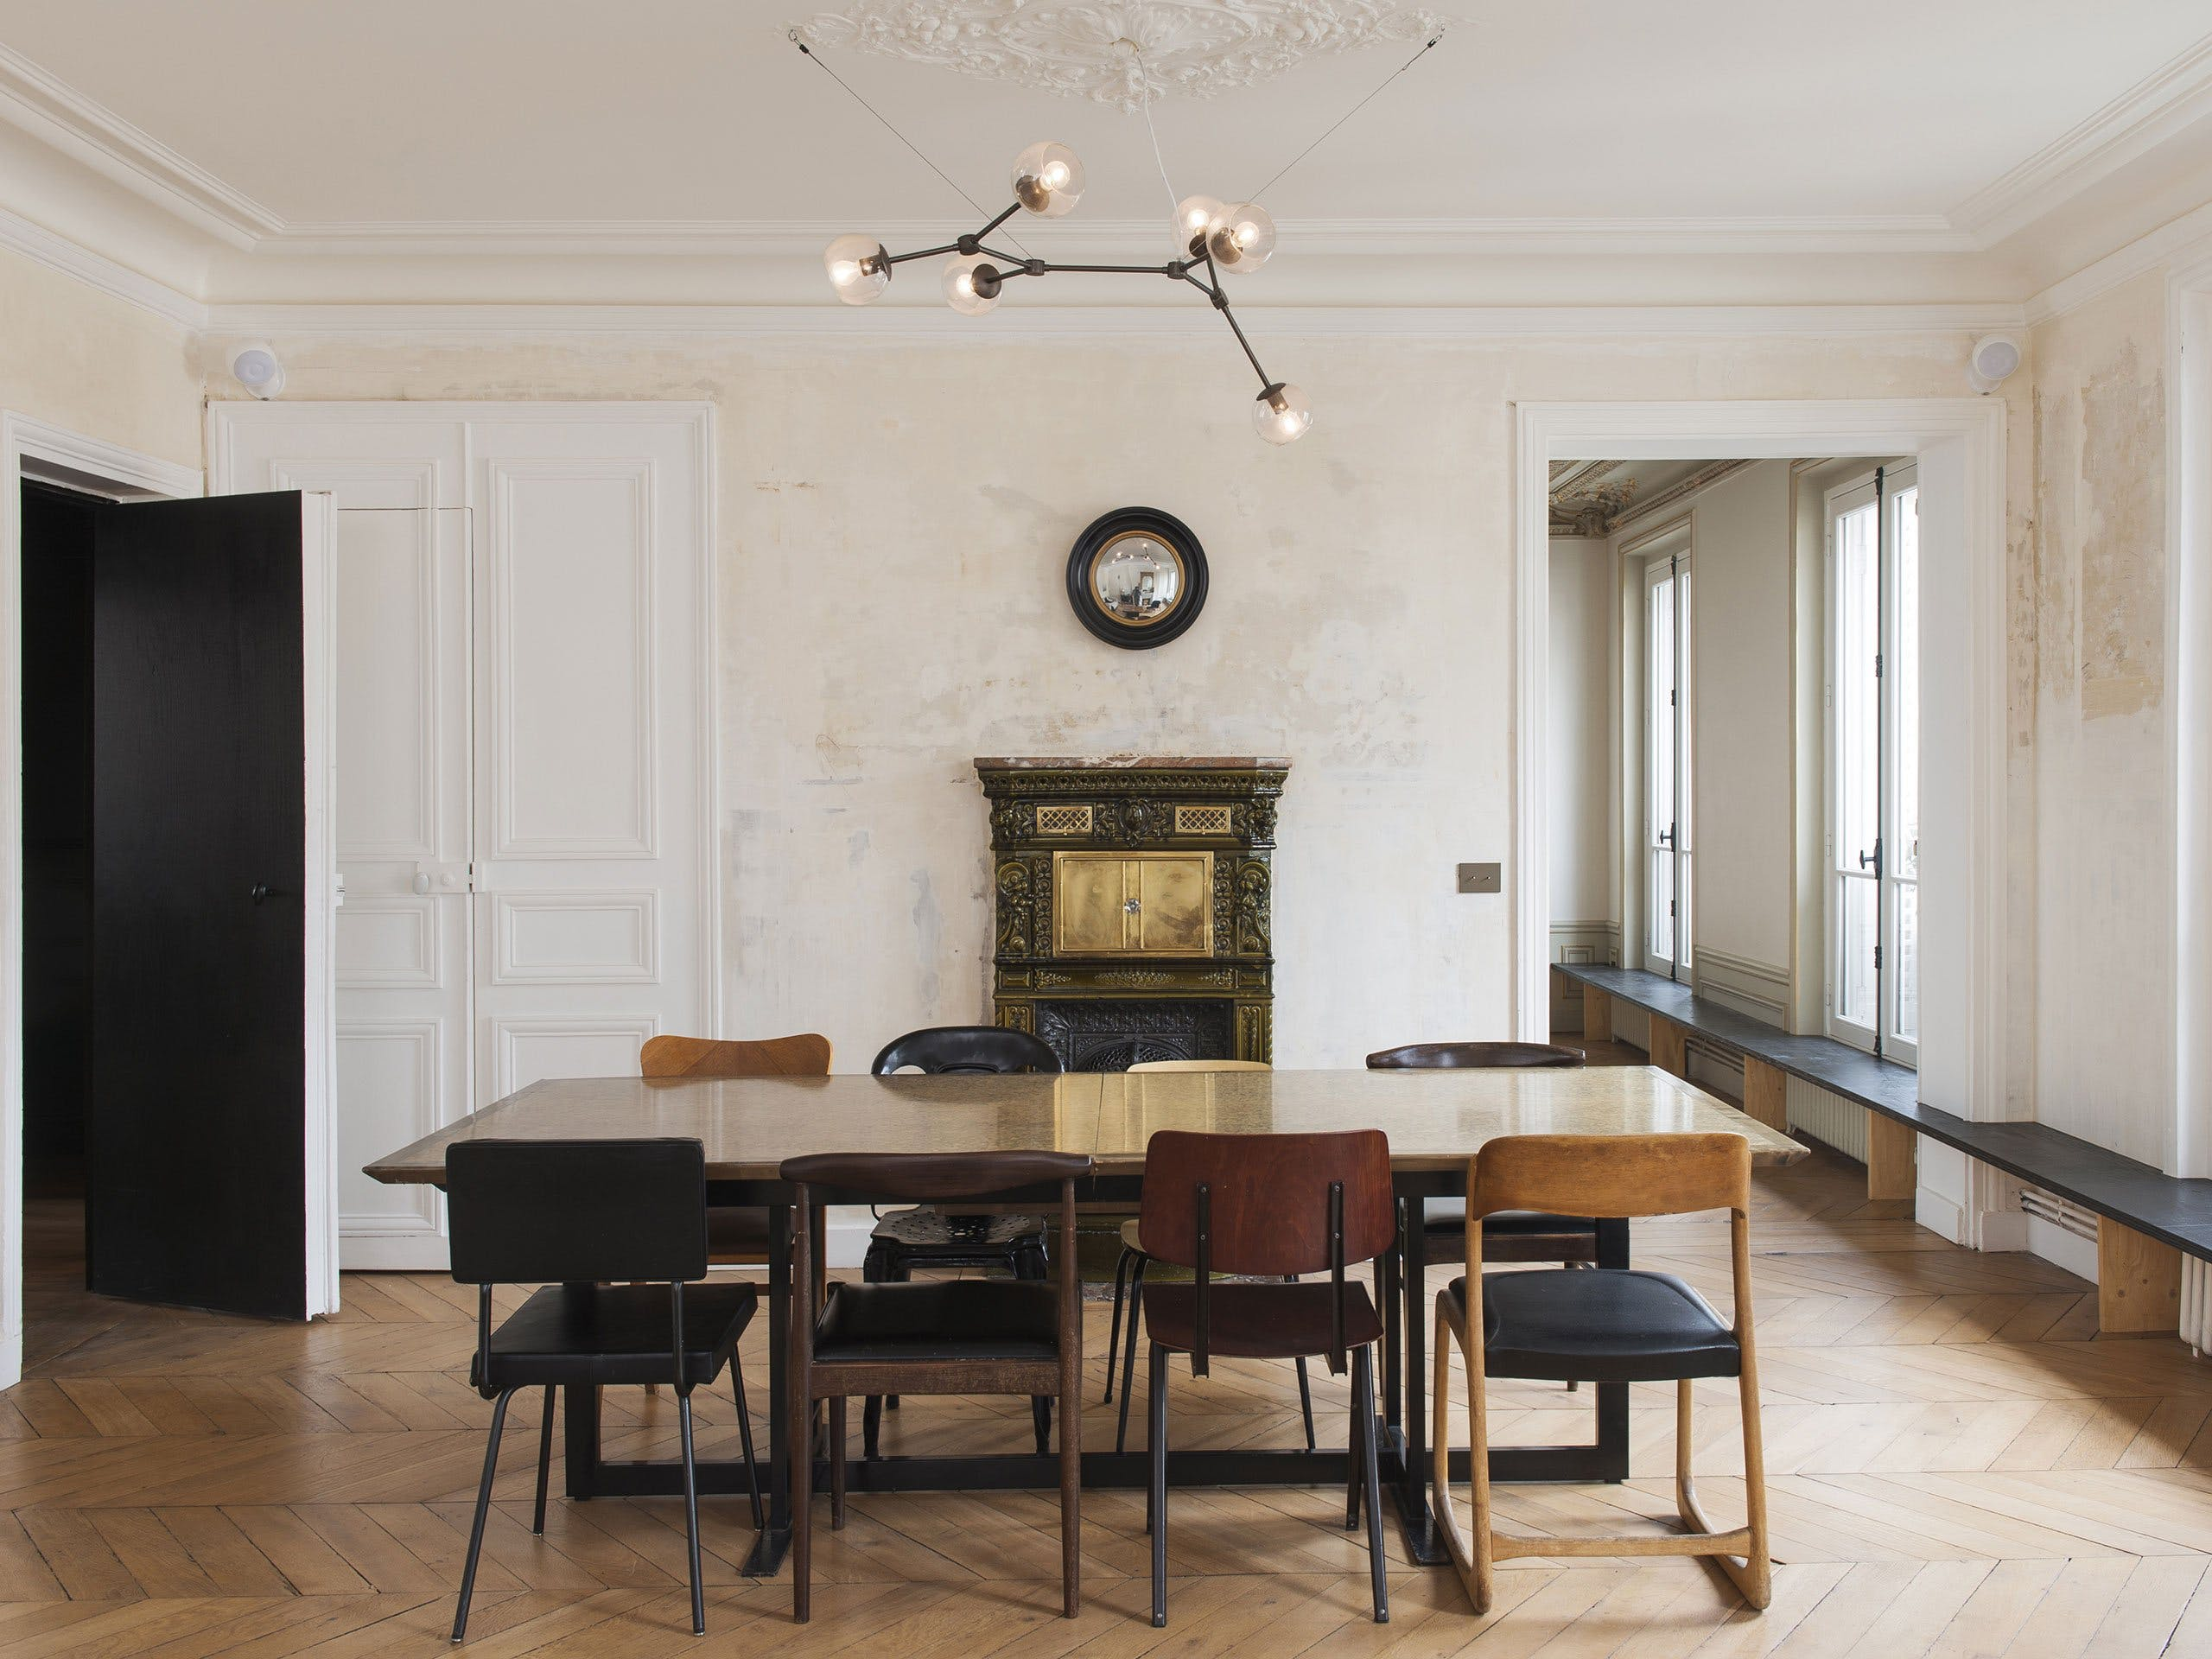 Renovated Parisian Apartment by Diego Delgado-Elias